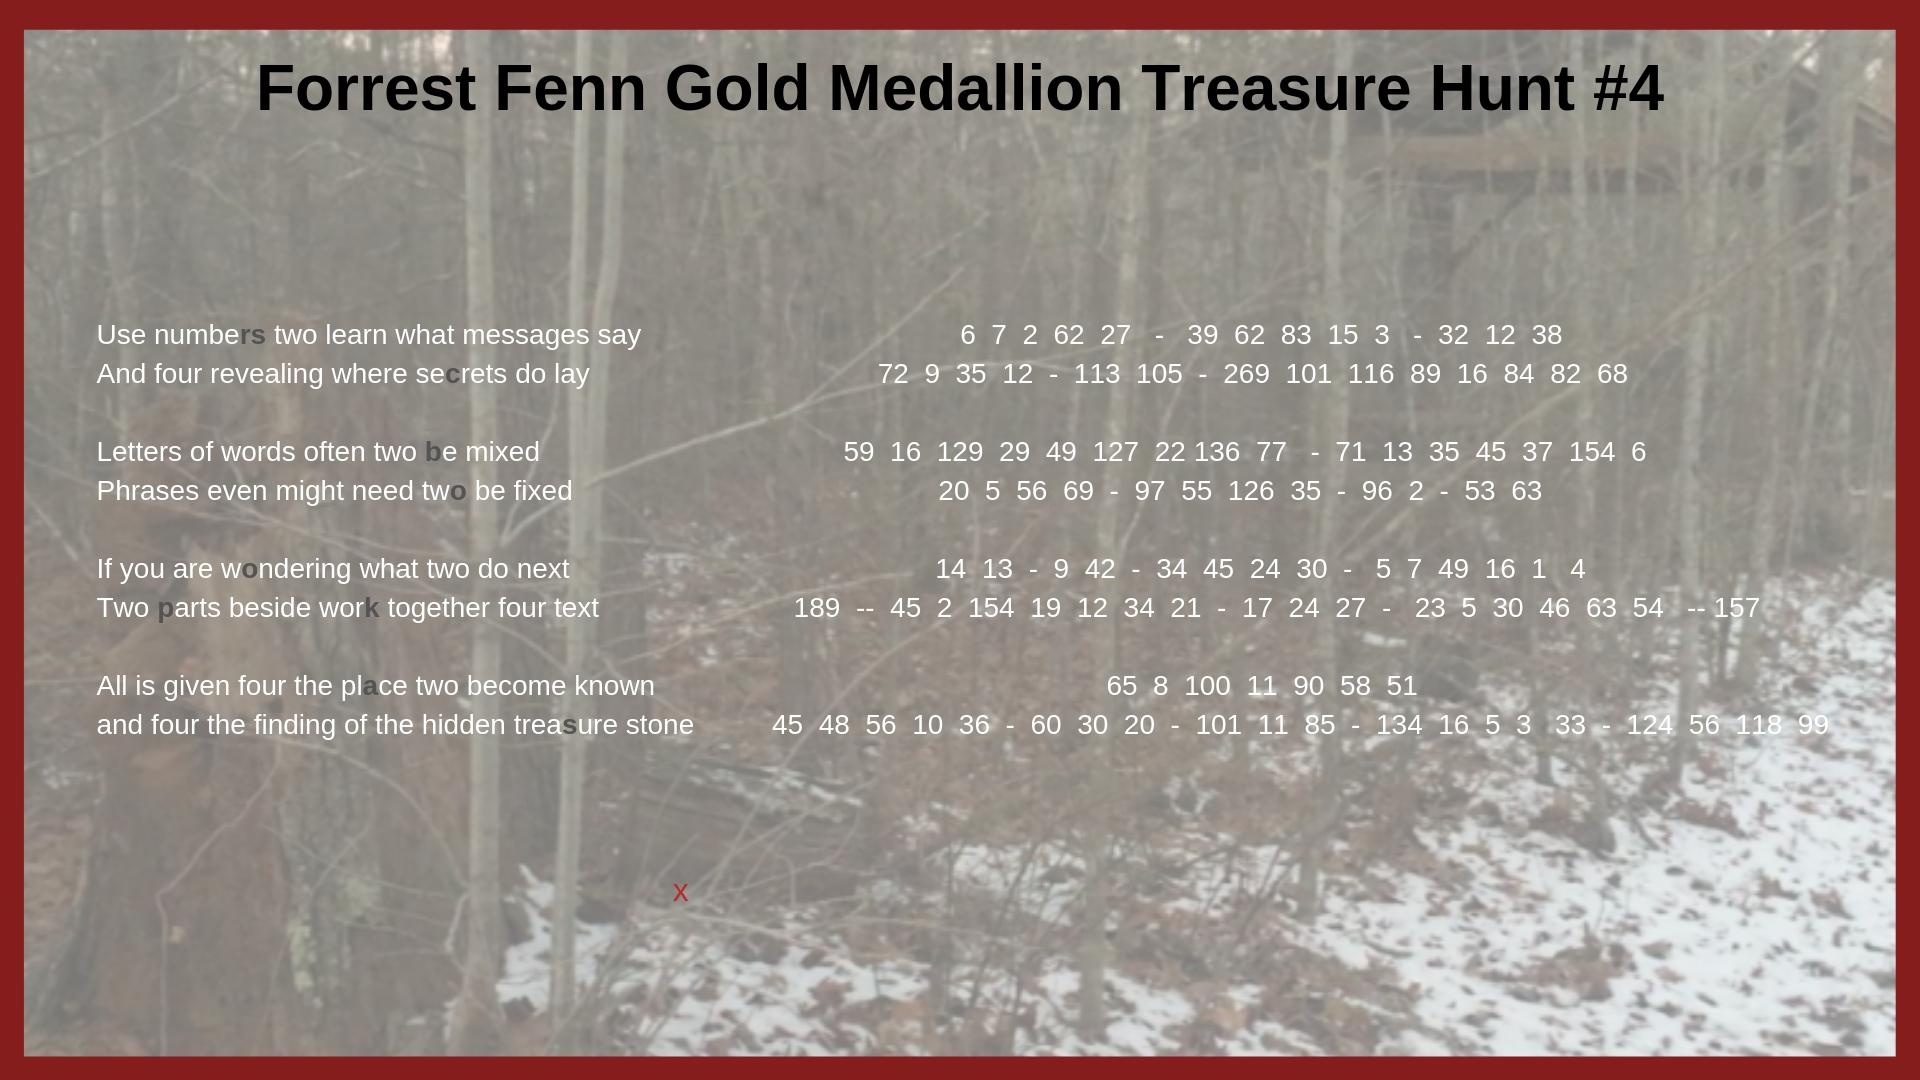 Forrest Fenn Gold Medallion Treasure Hunt #4 Clues – Mysterious Writings